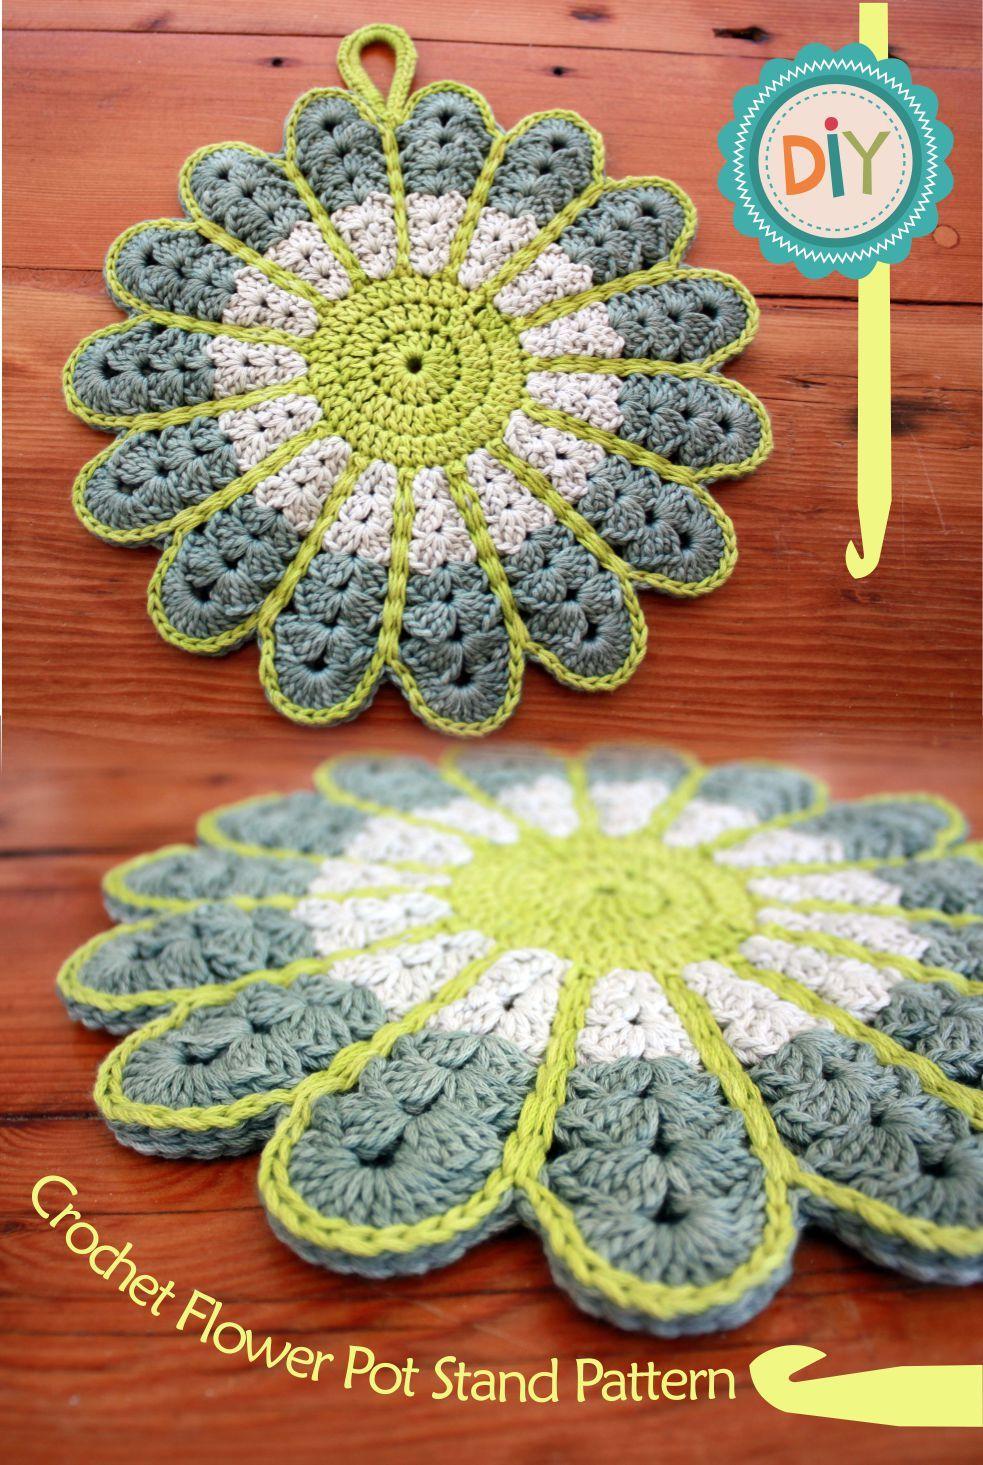 Colorful Crochet Flower Pot Holder with FREE Pattern | Pinterest ...